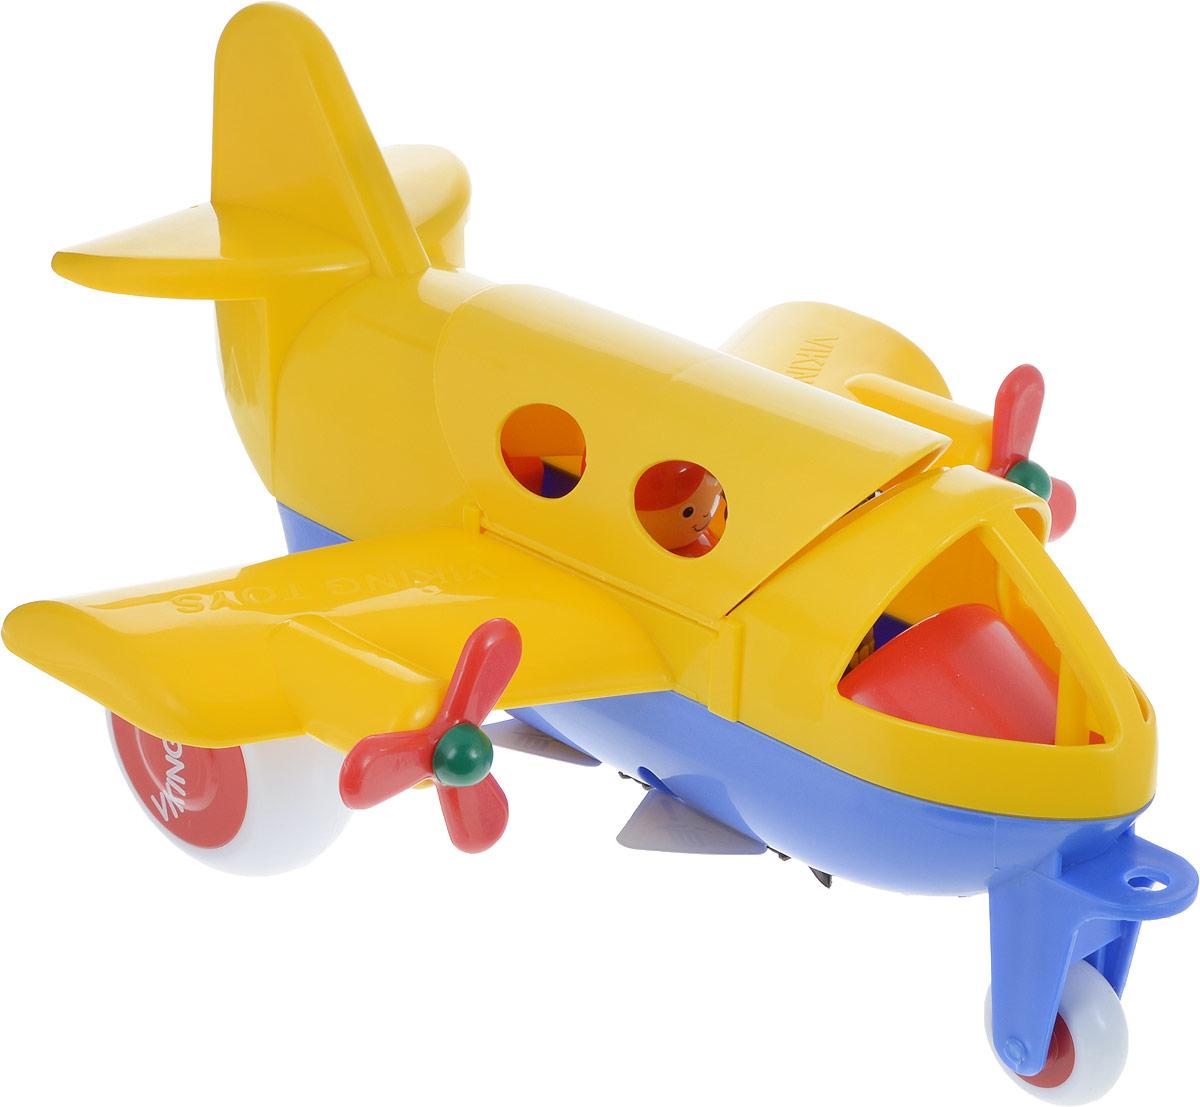 Viking Toys Самолет Джамбо цвет желтый - Транспорт, машинки